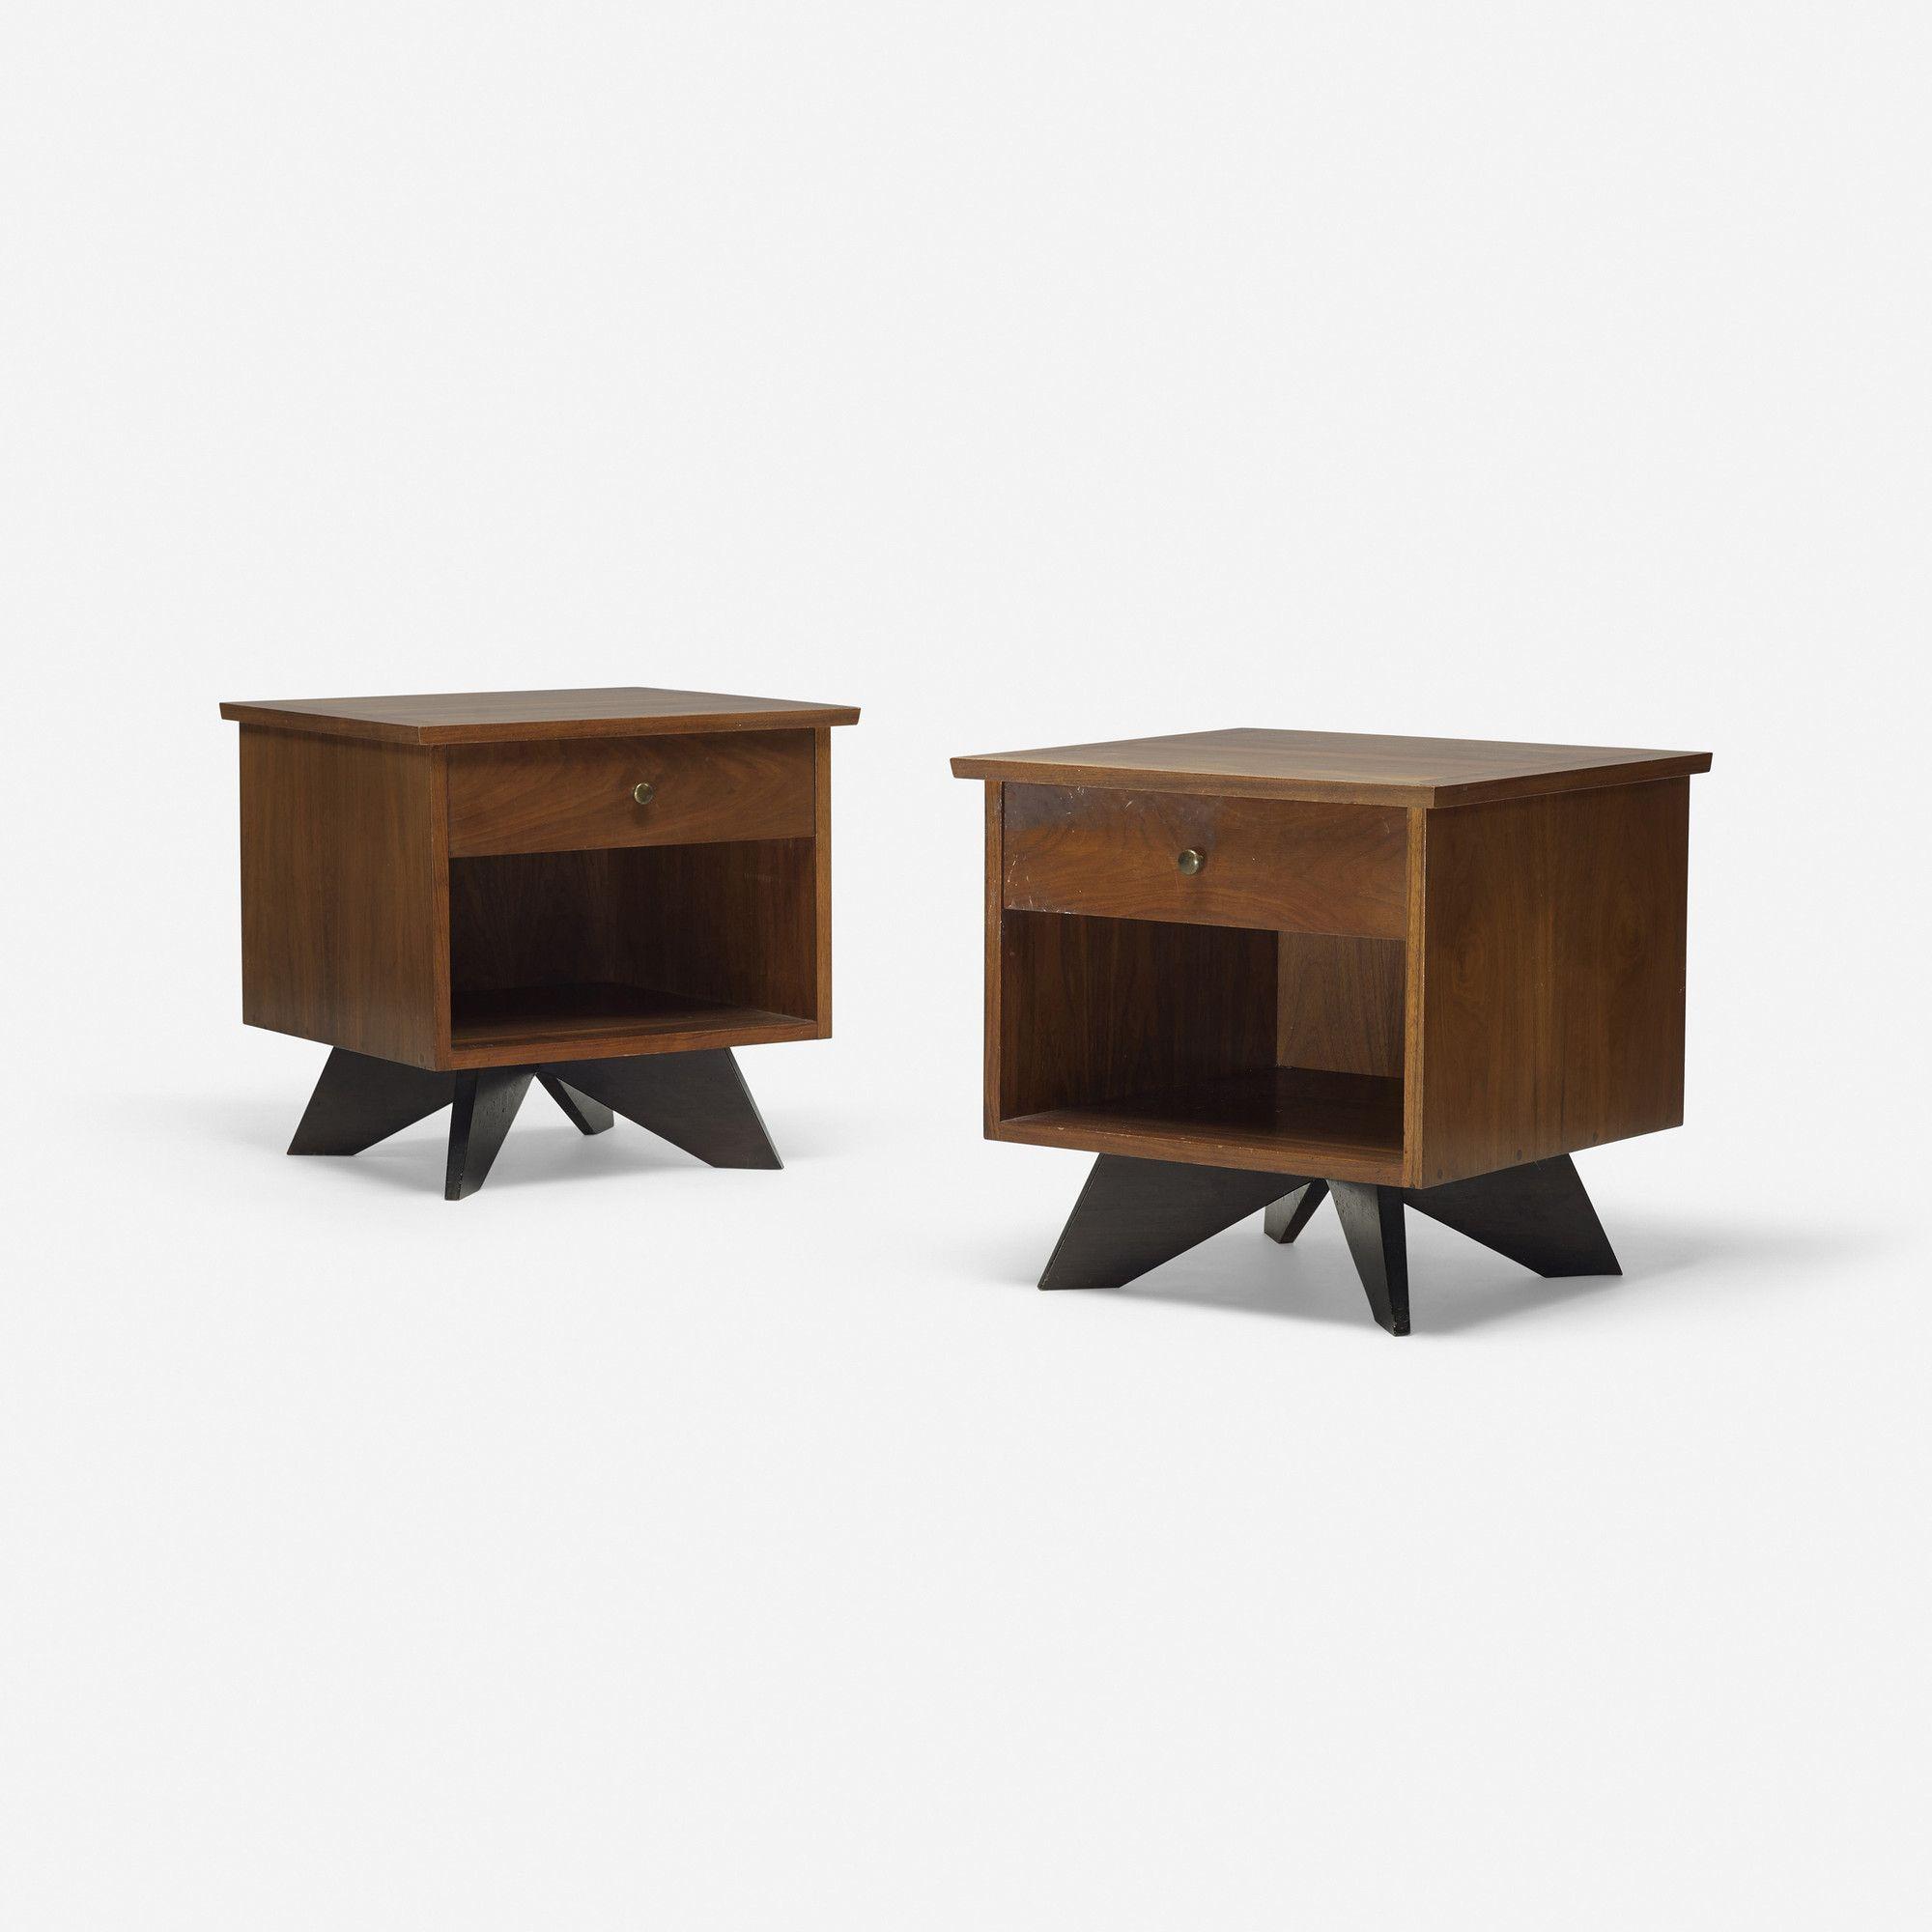 d9e5561ec5a348242b853c2faa477cd6 Incroyable De Table Basse Le Corbusier Concept